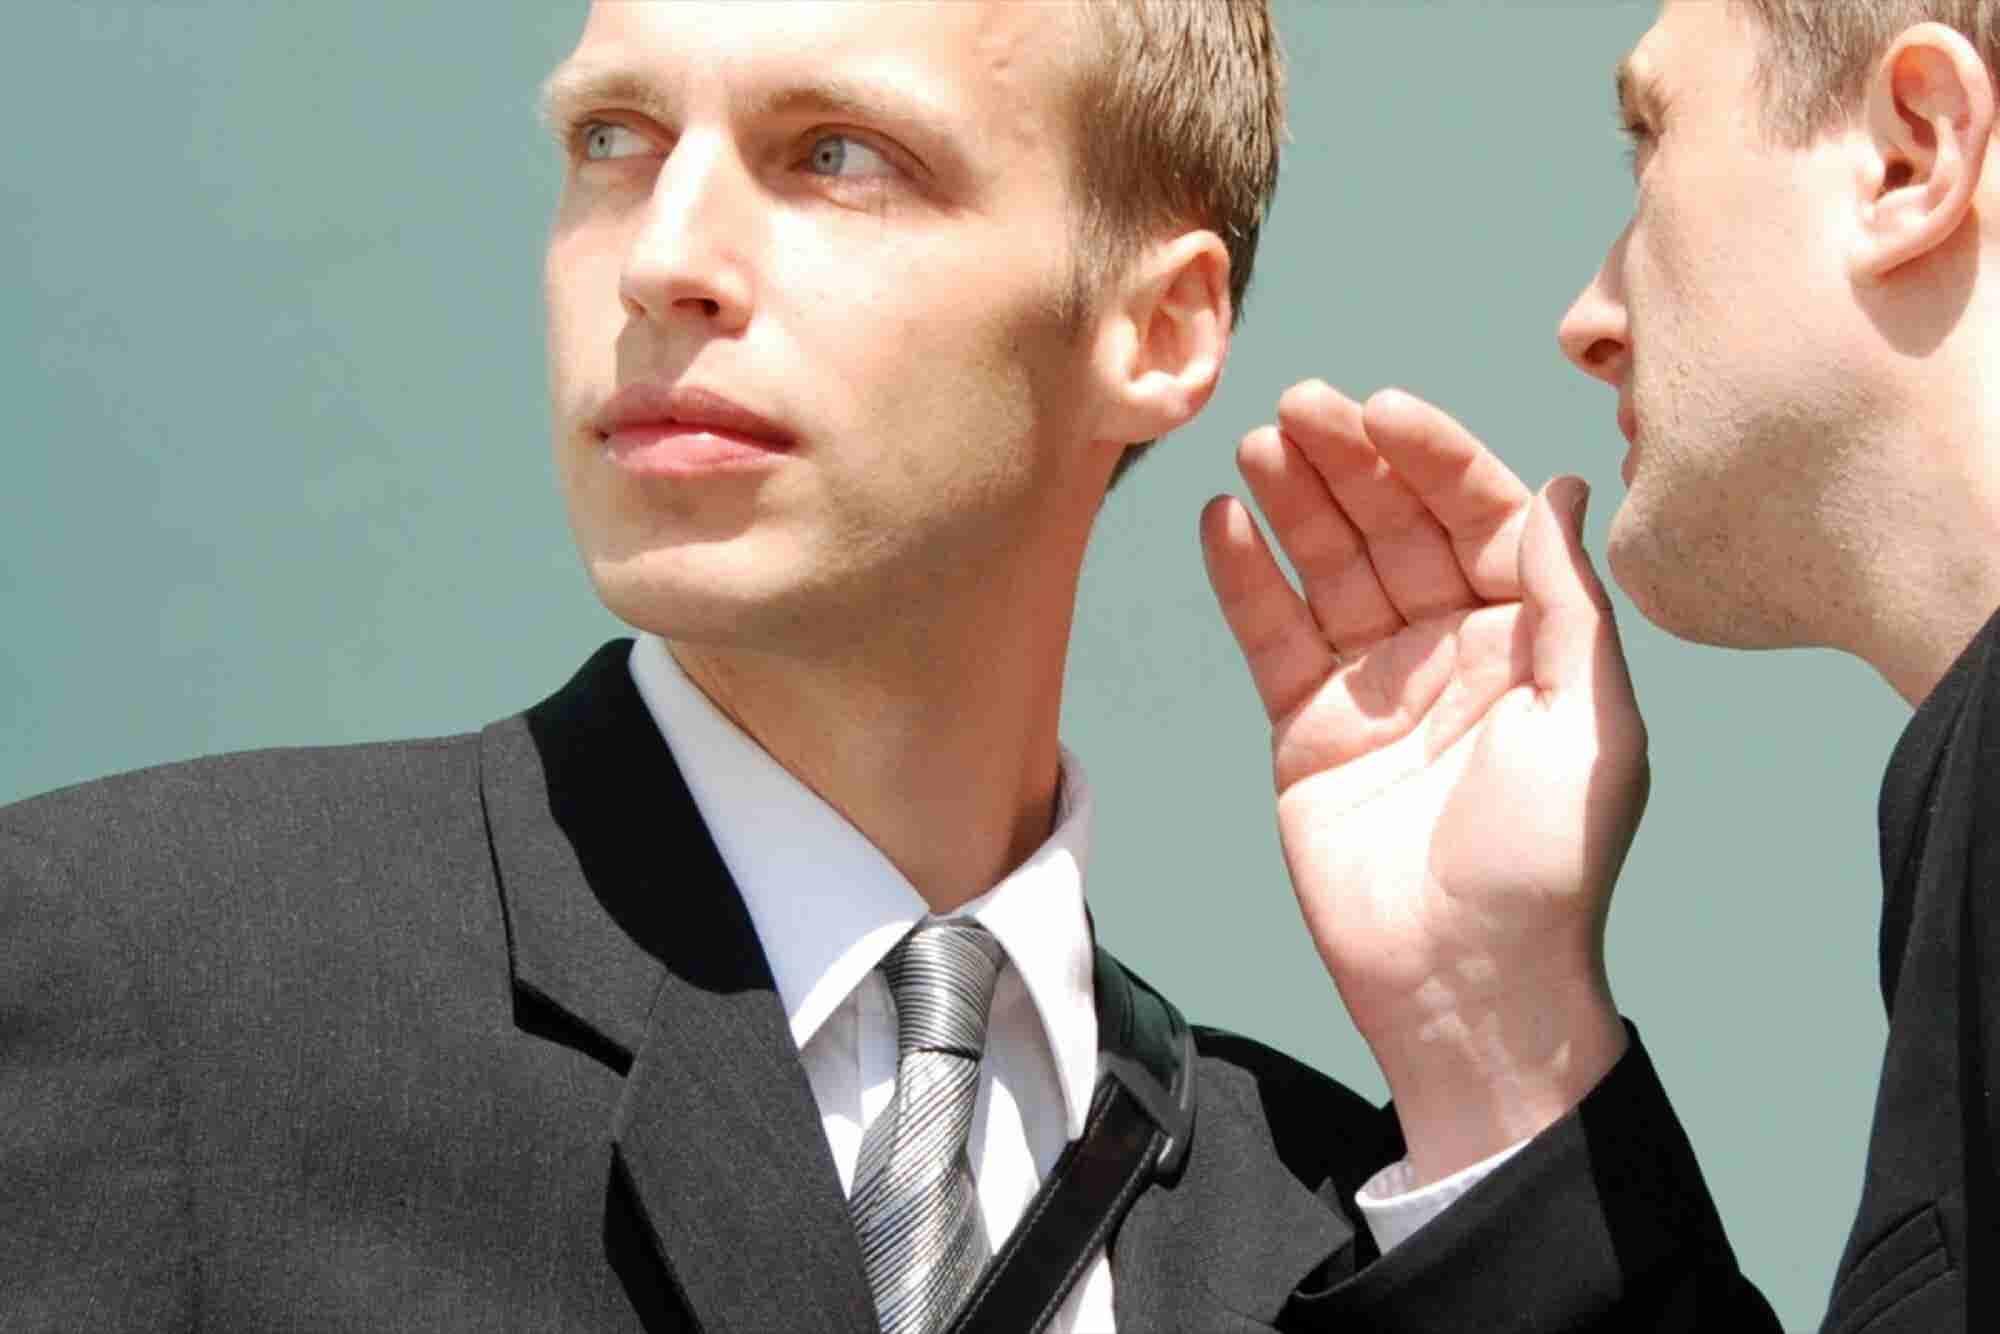 Closing the Deal: 6 Savvy Entrepreneurs Share Their Secrets